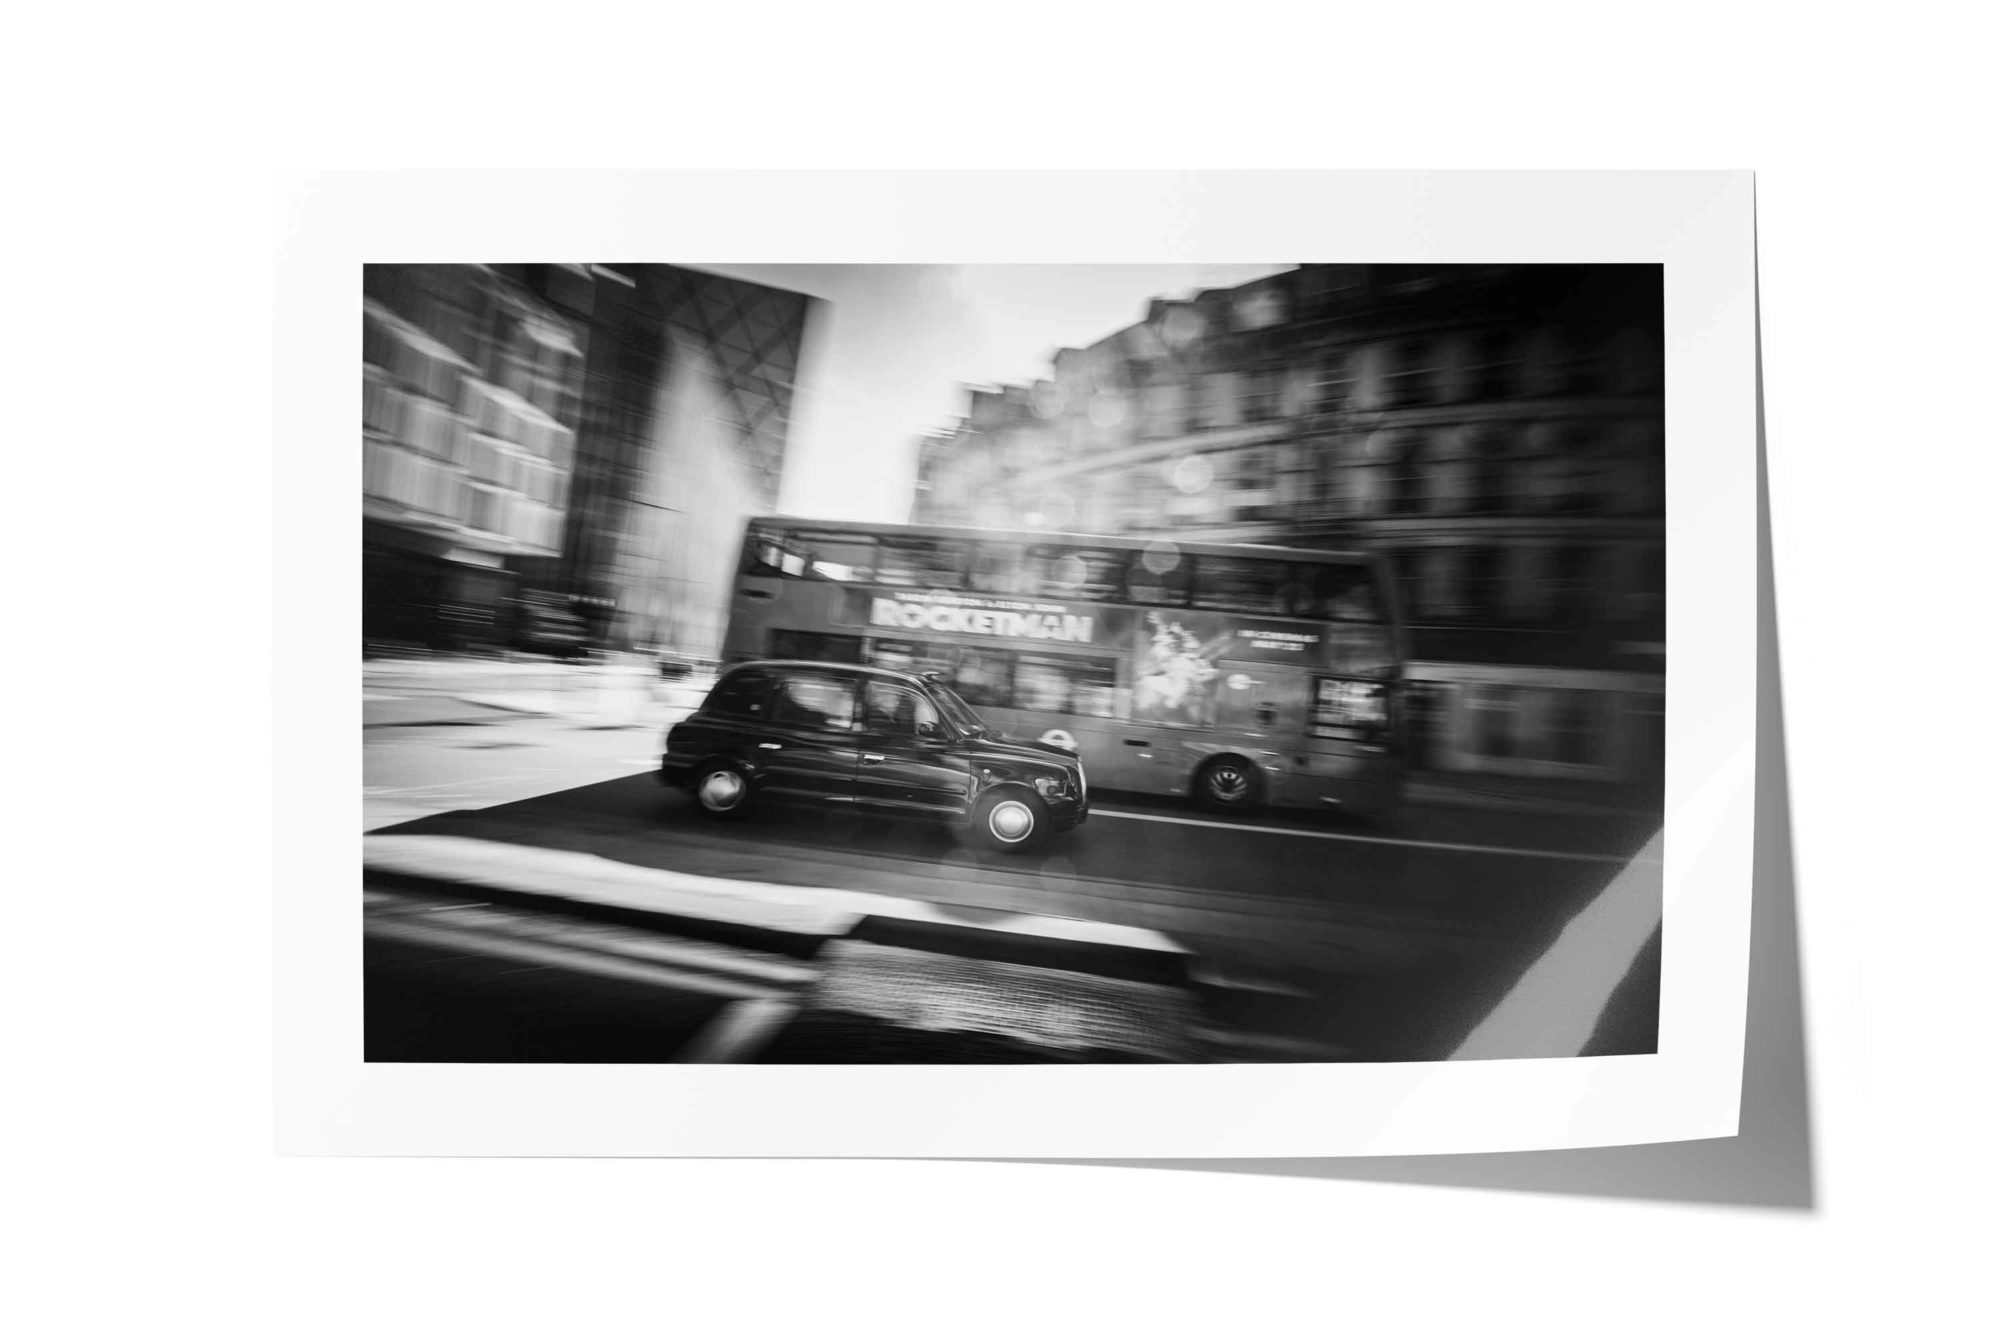 London Cab, Taxi, London, England, United Kingdom, Great Brittain